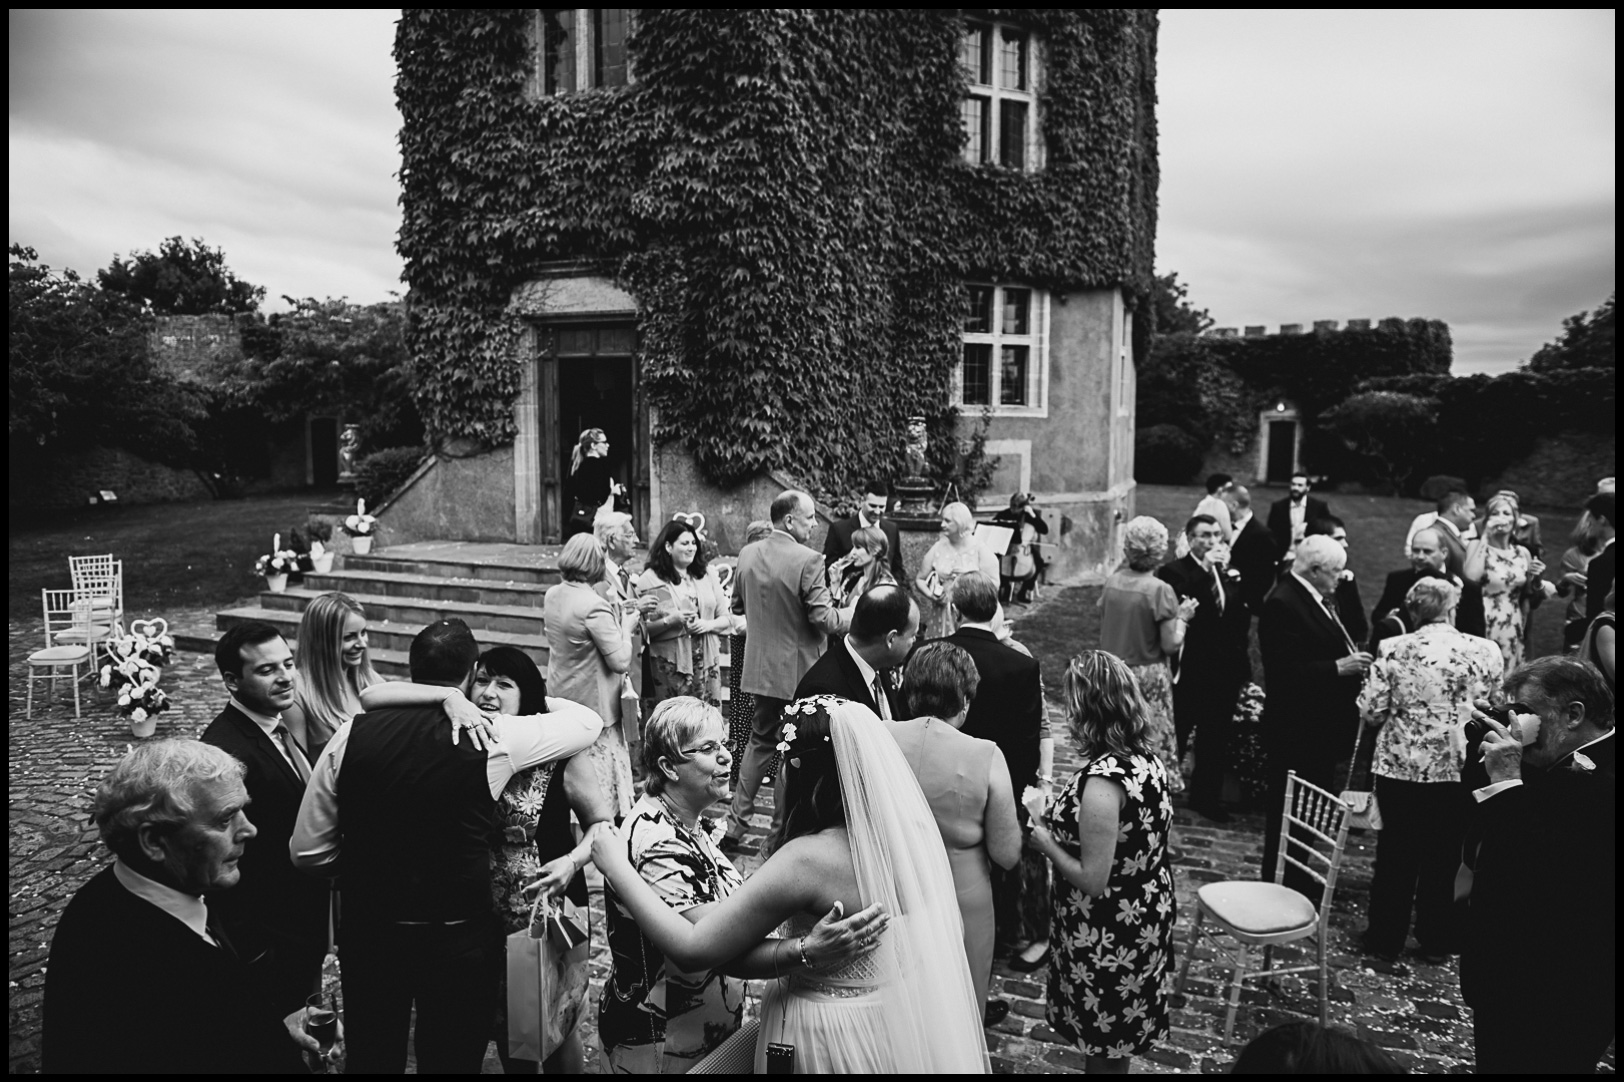 walton-castle-wedding.jpg